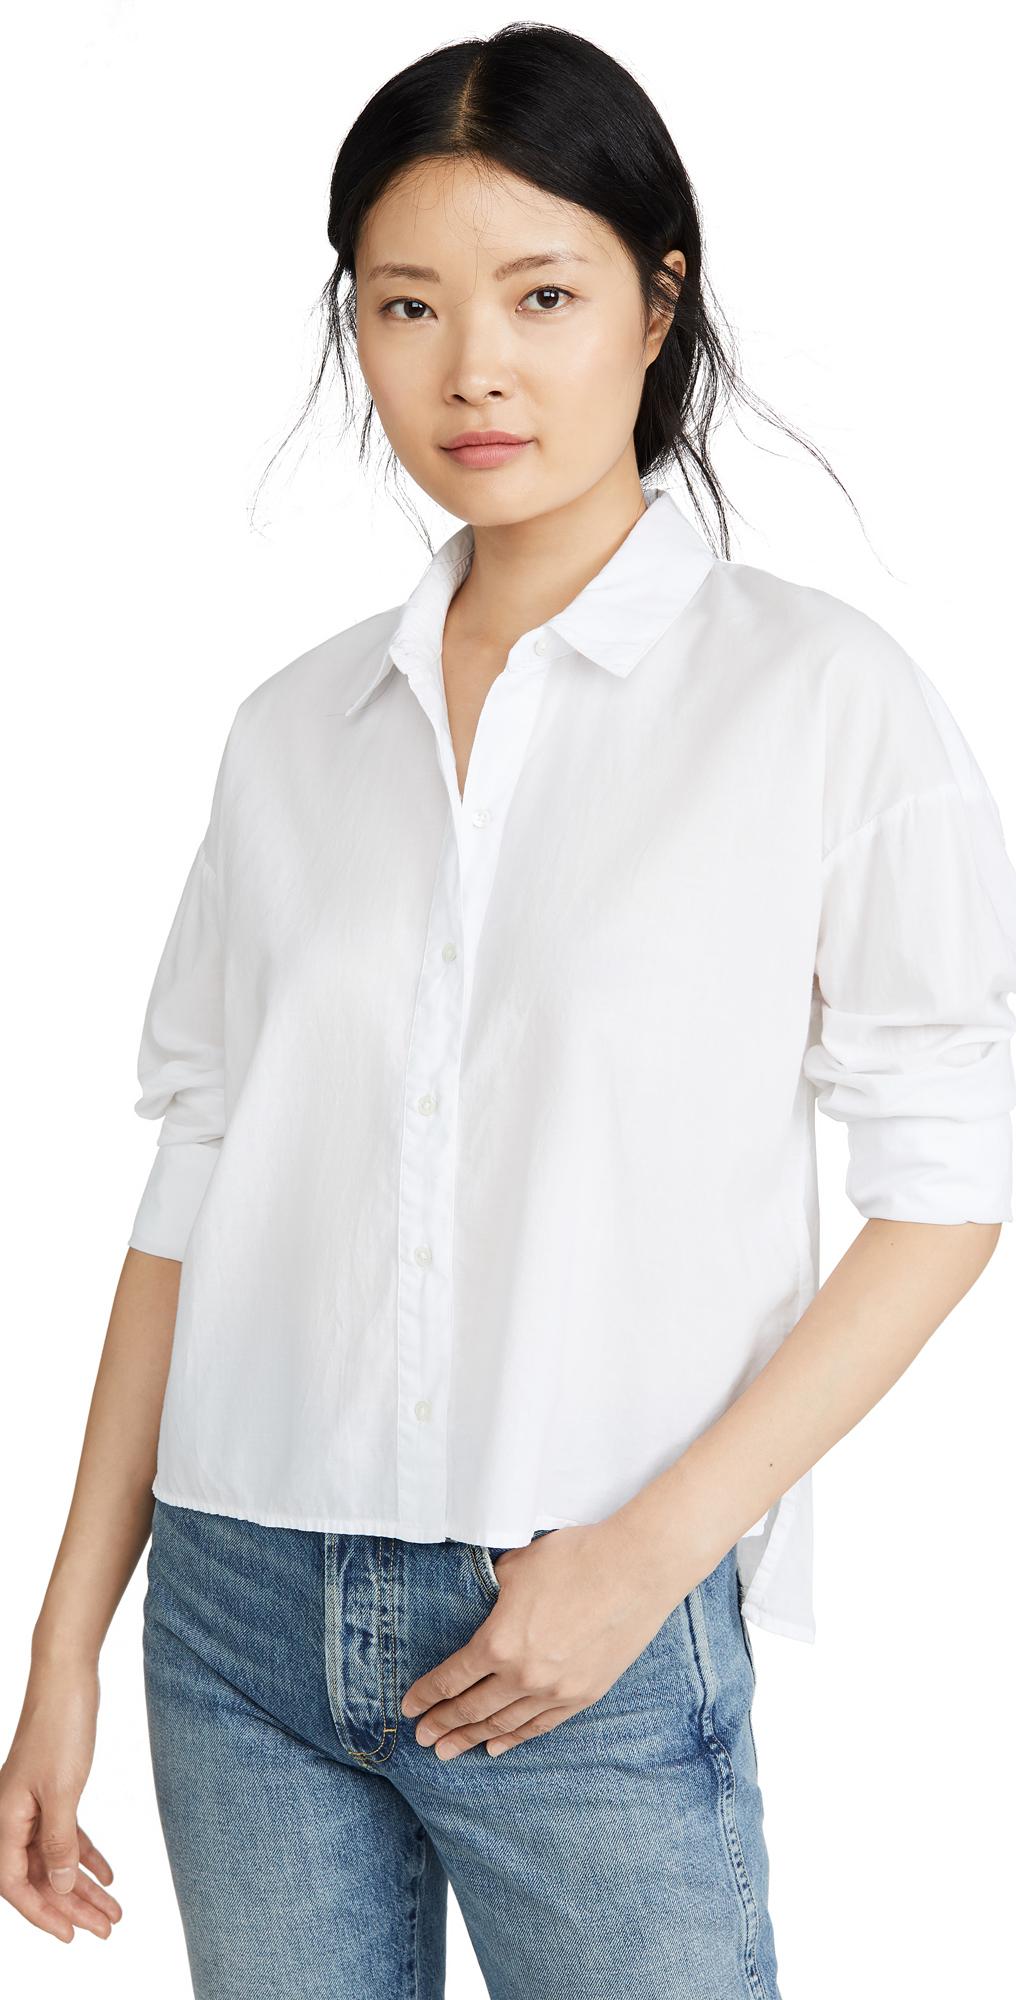 James Perse Boxy Shirt